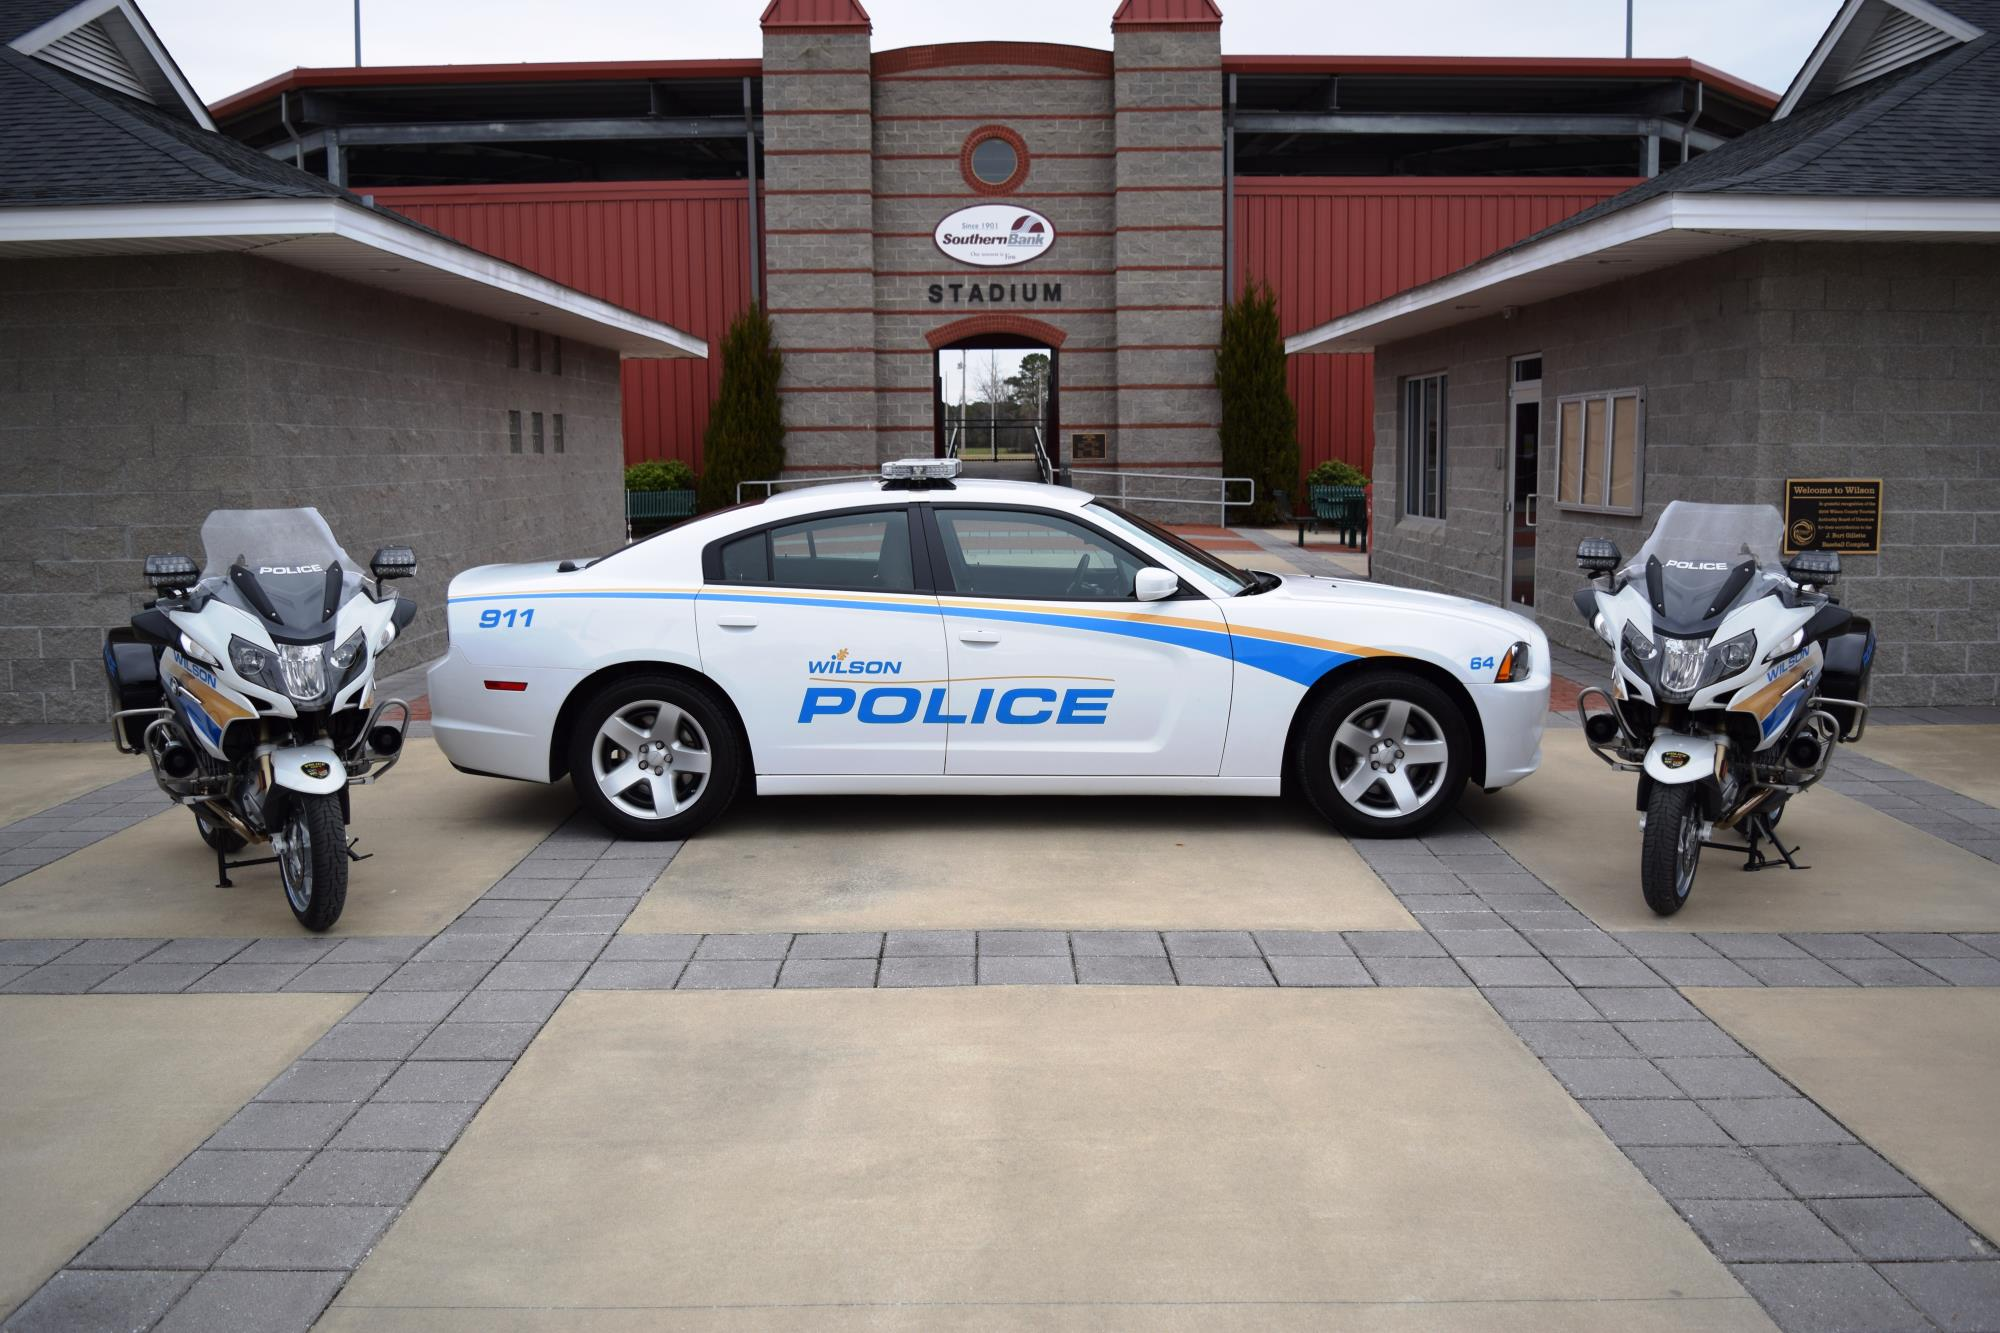 Police | Wilson, NC